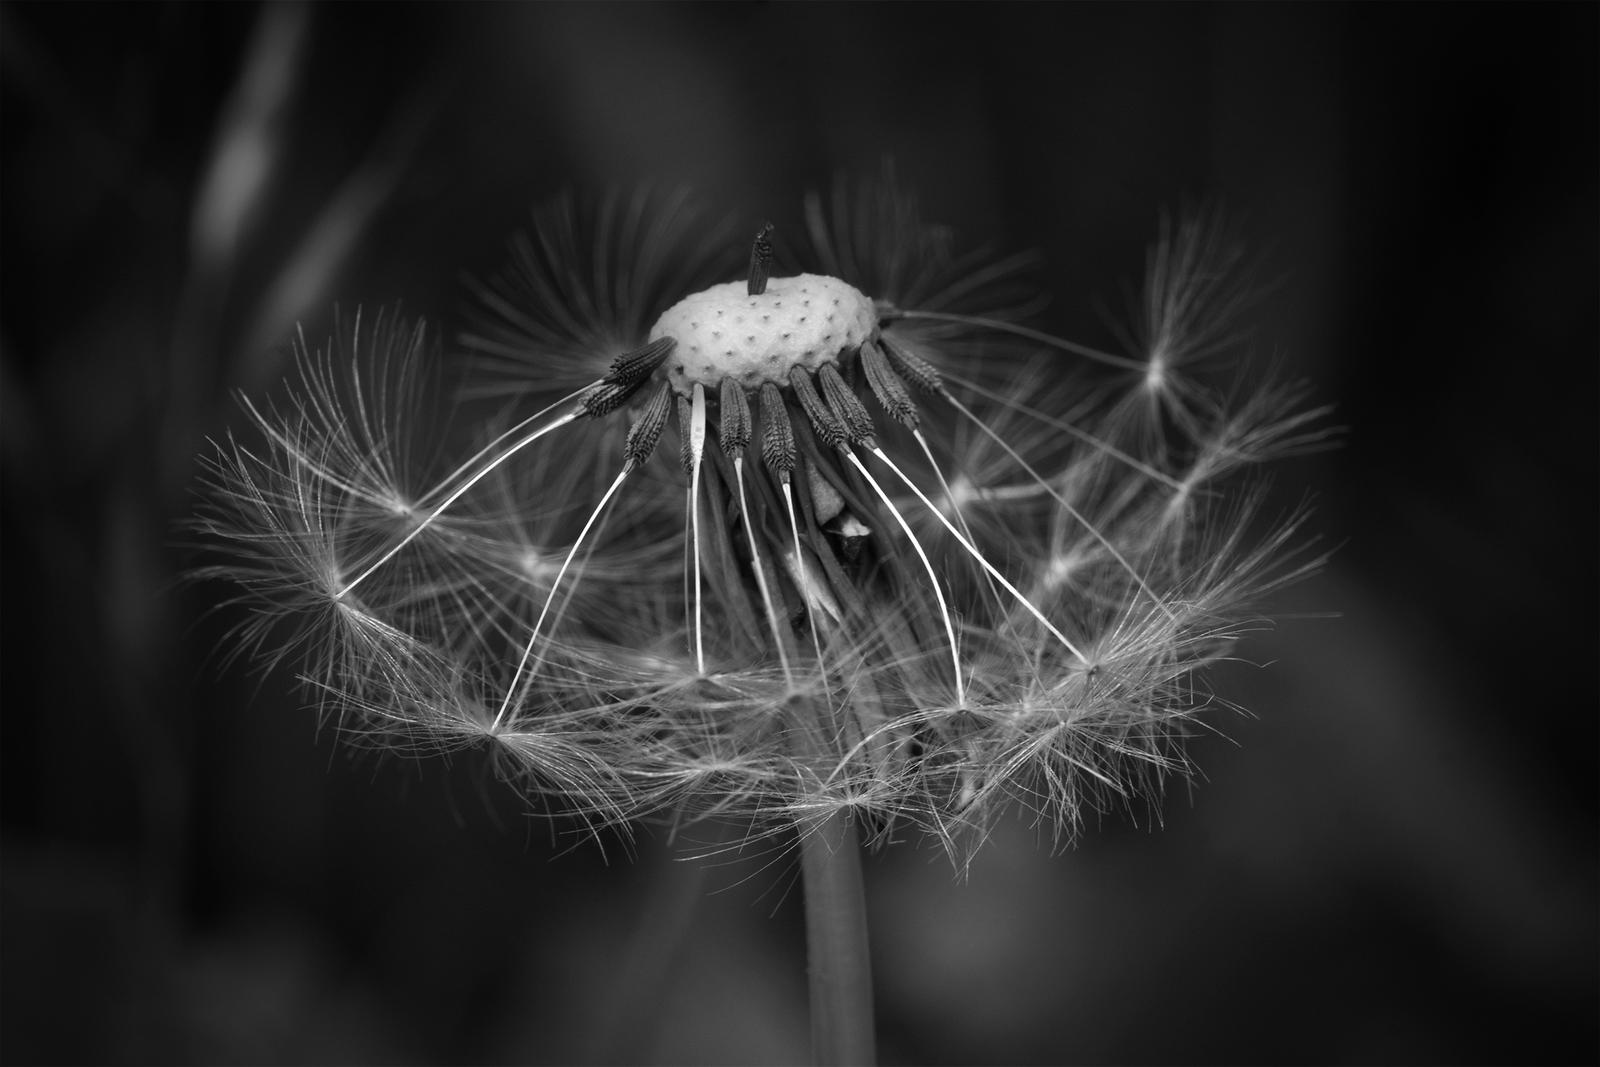 Hairy Flowers 2